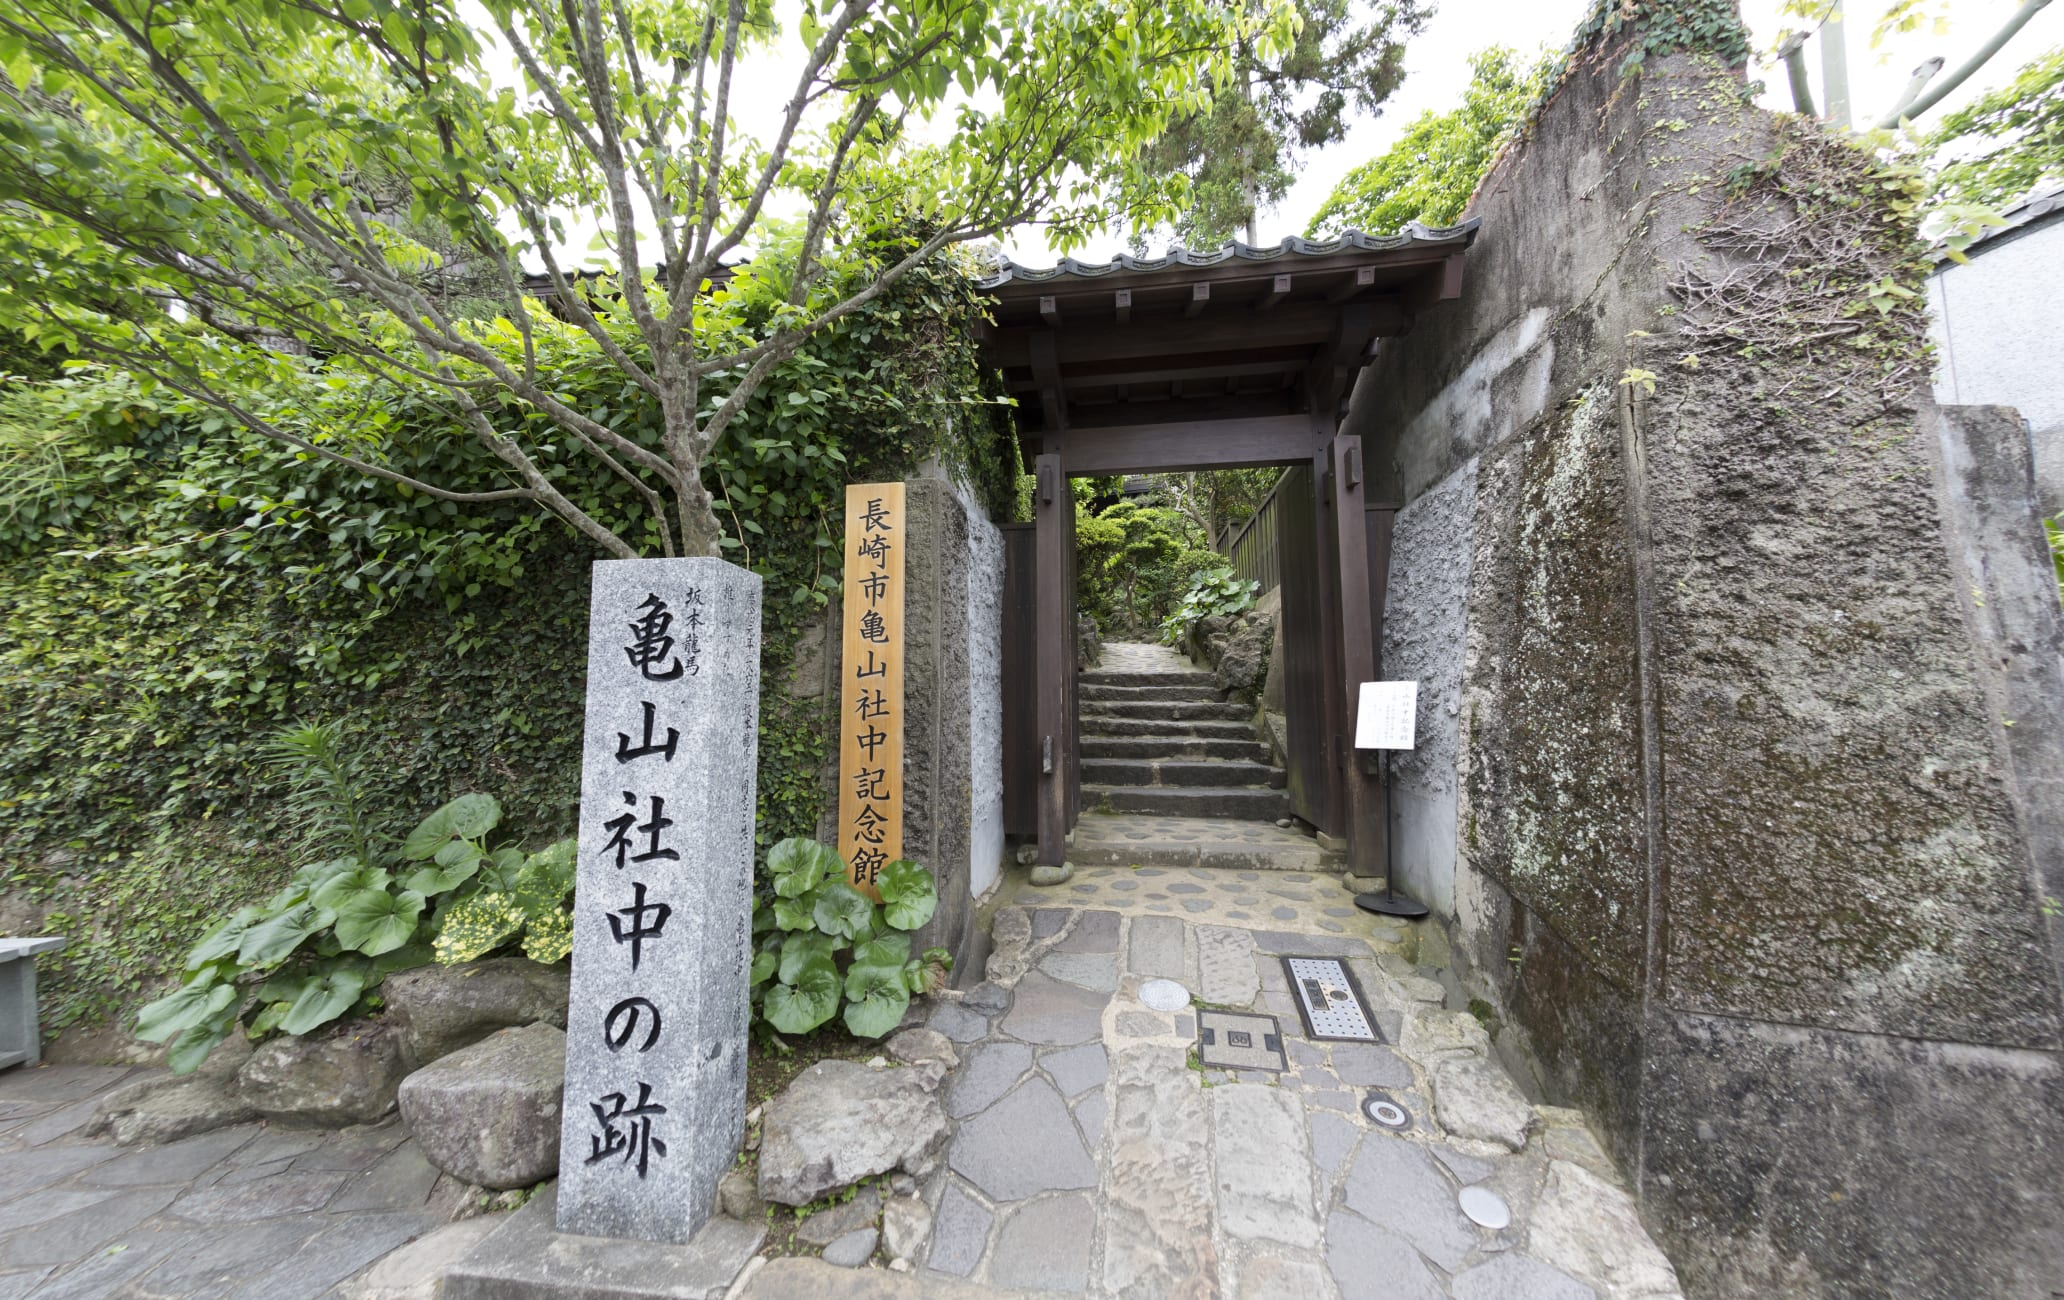 Kameyama Shachu Memorial Museum